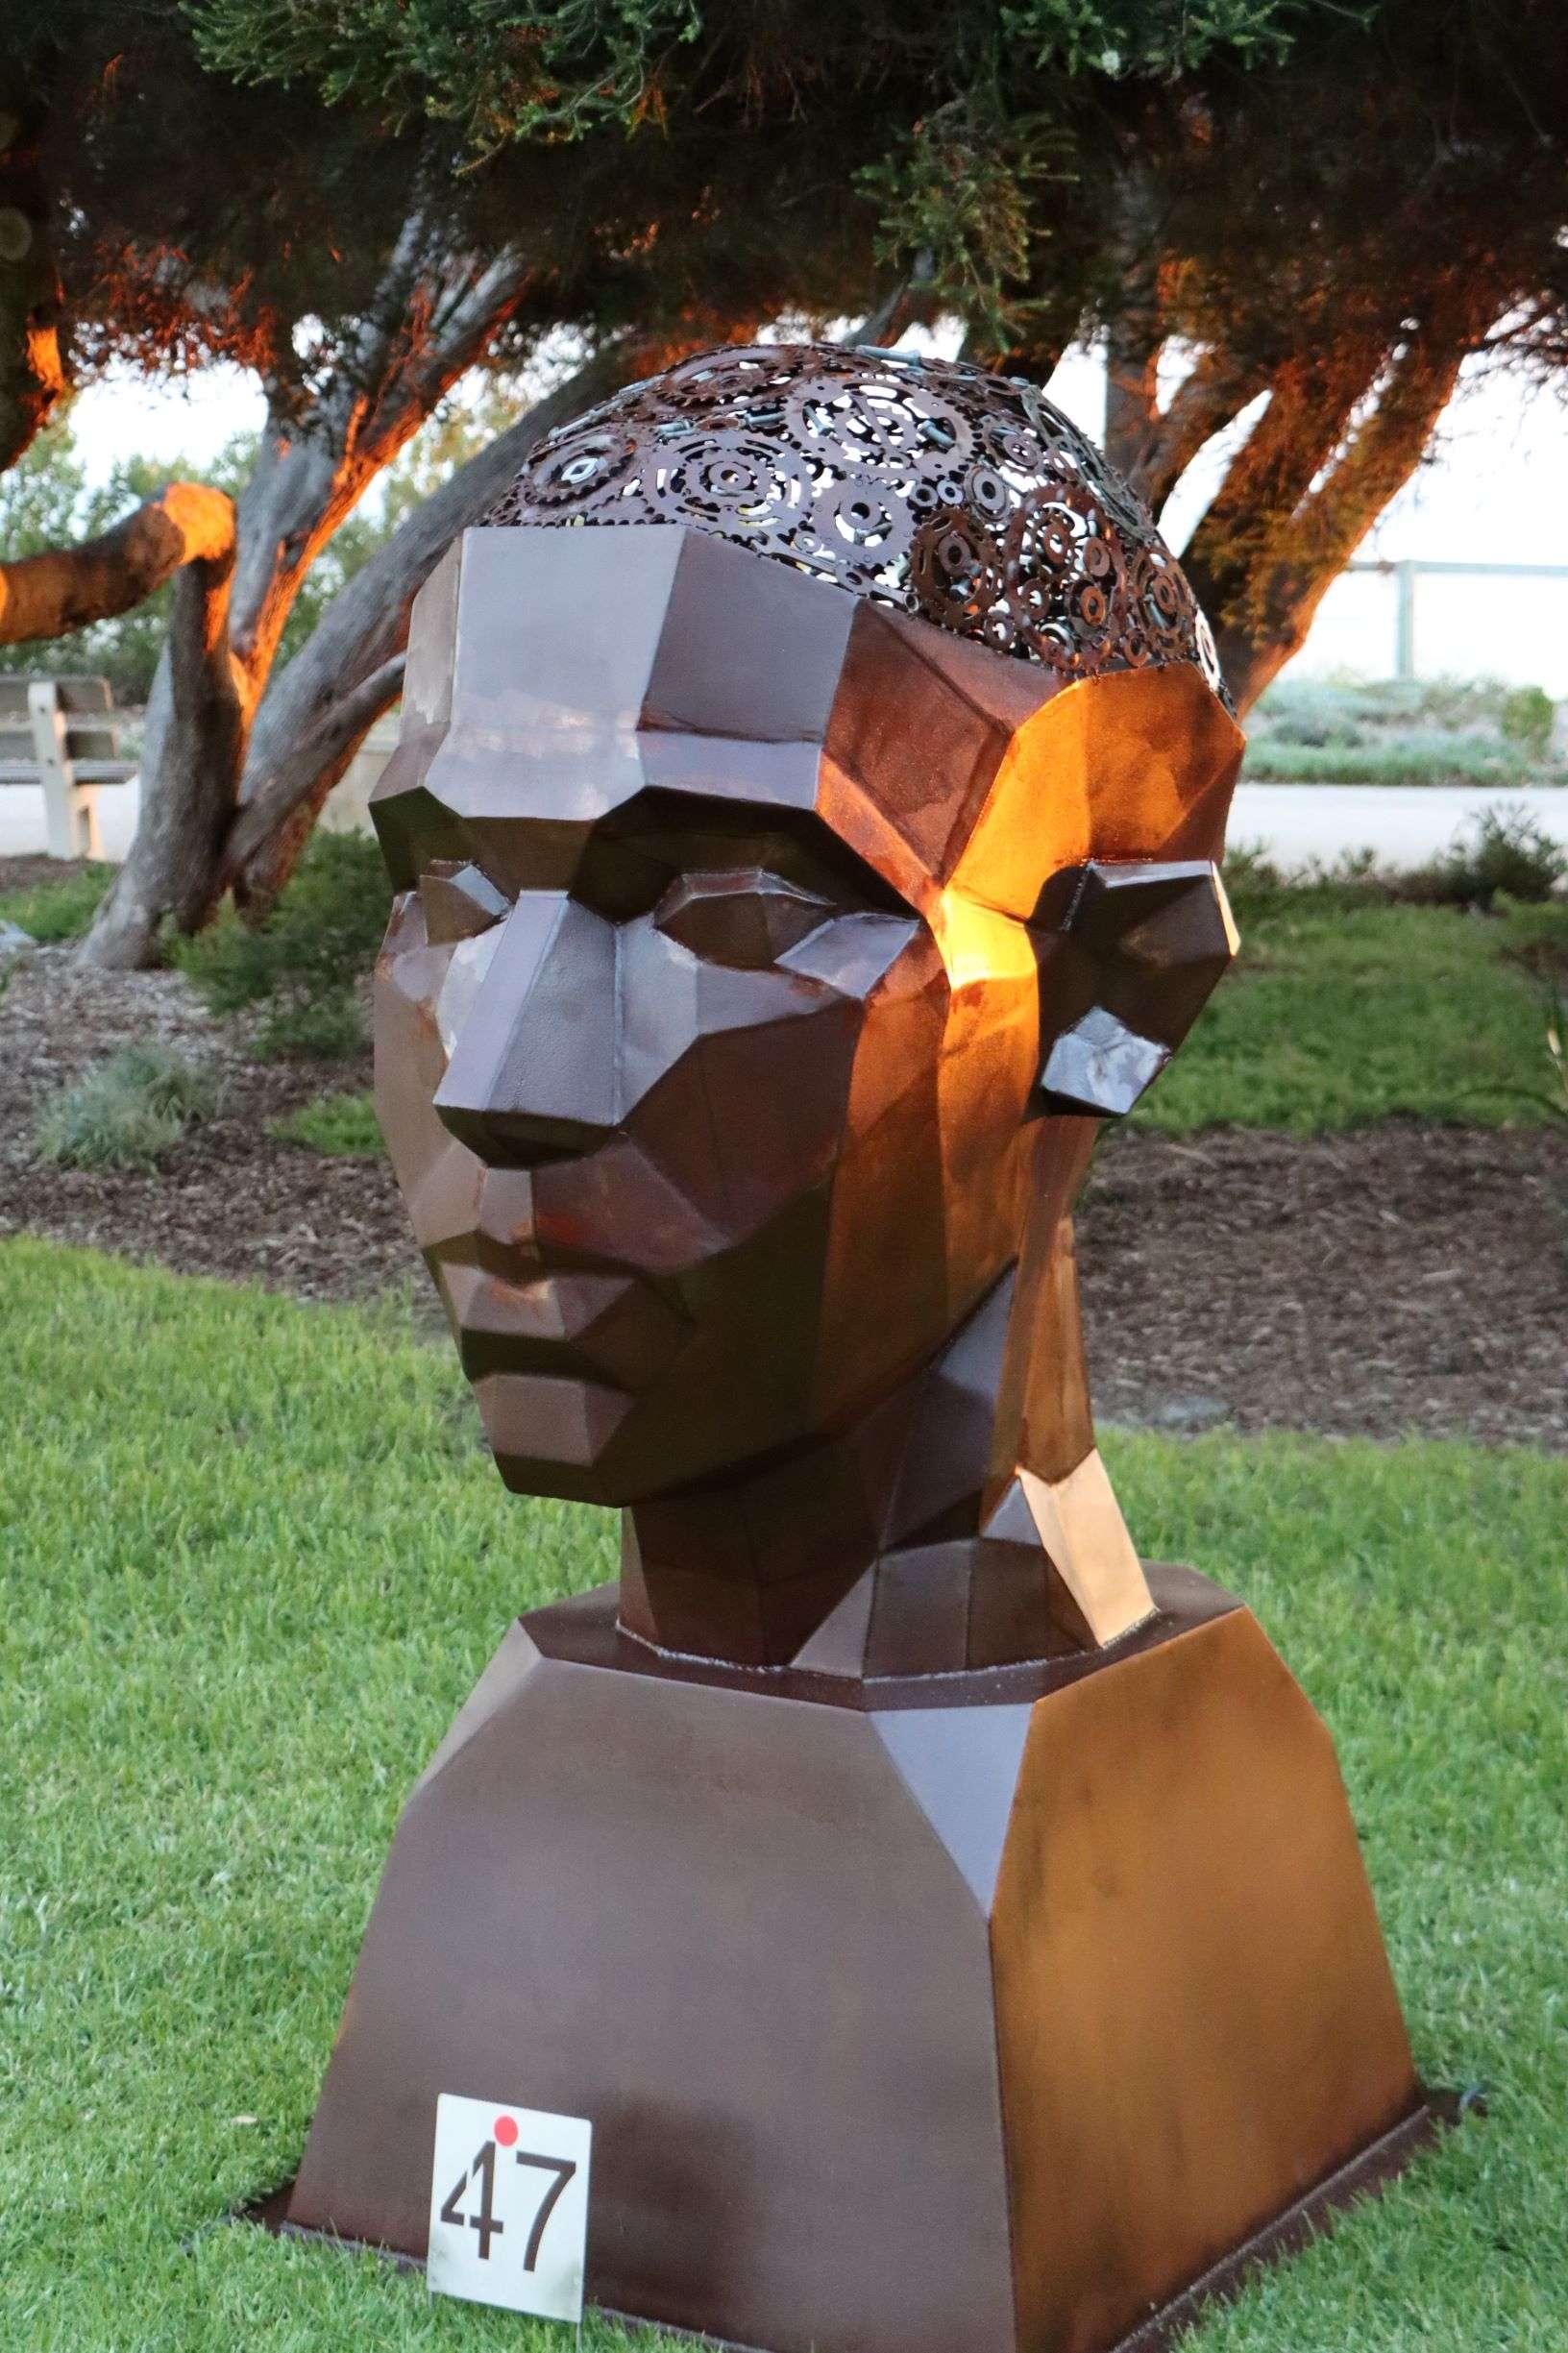 Mechanically Minded by Steve Bullock